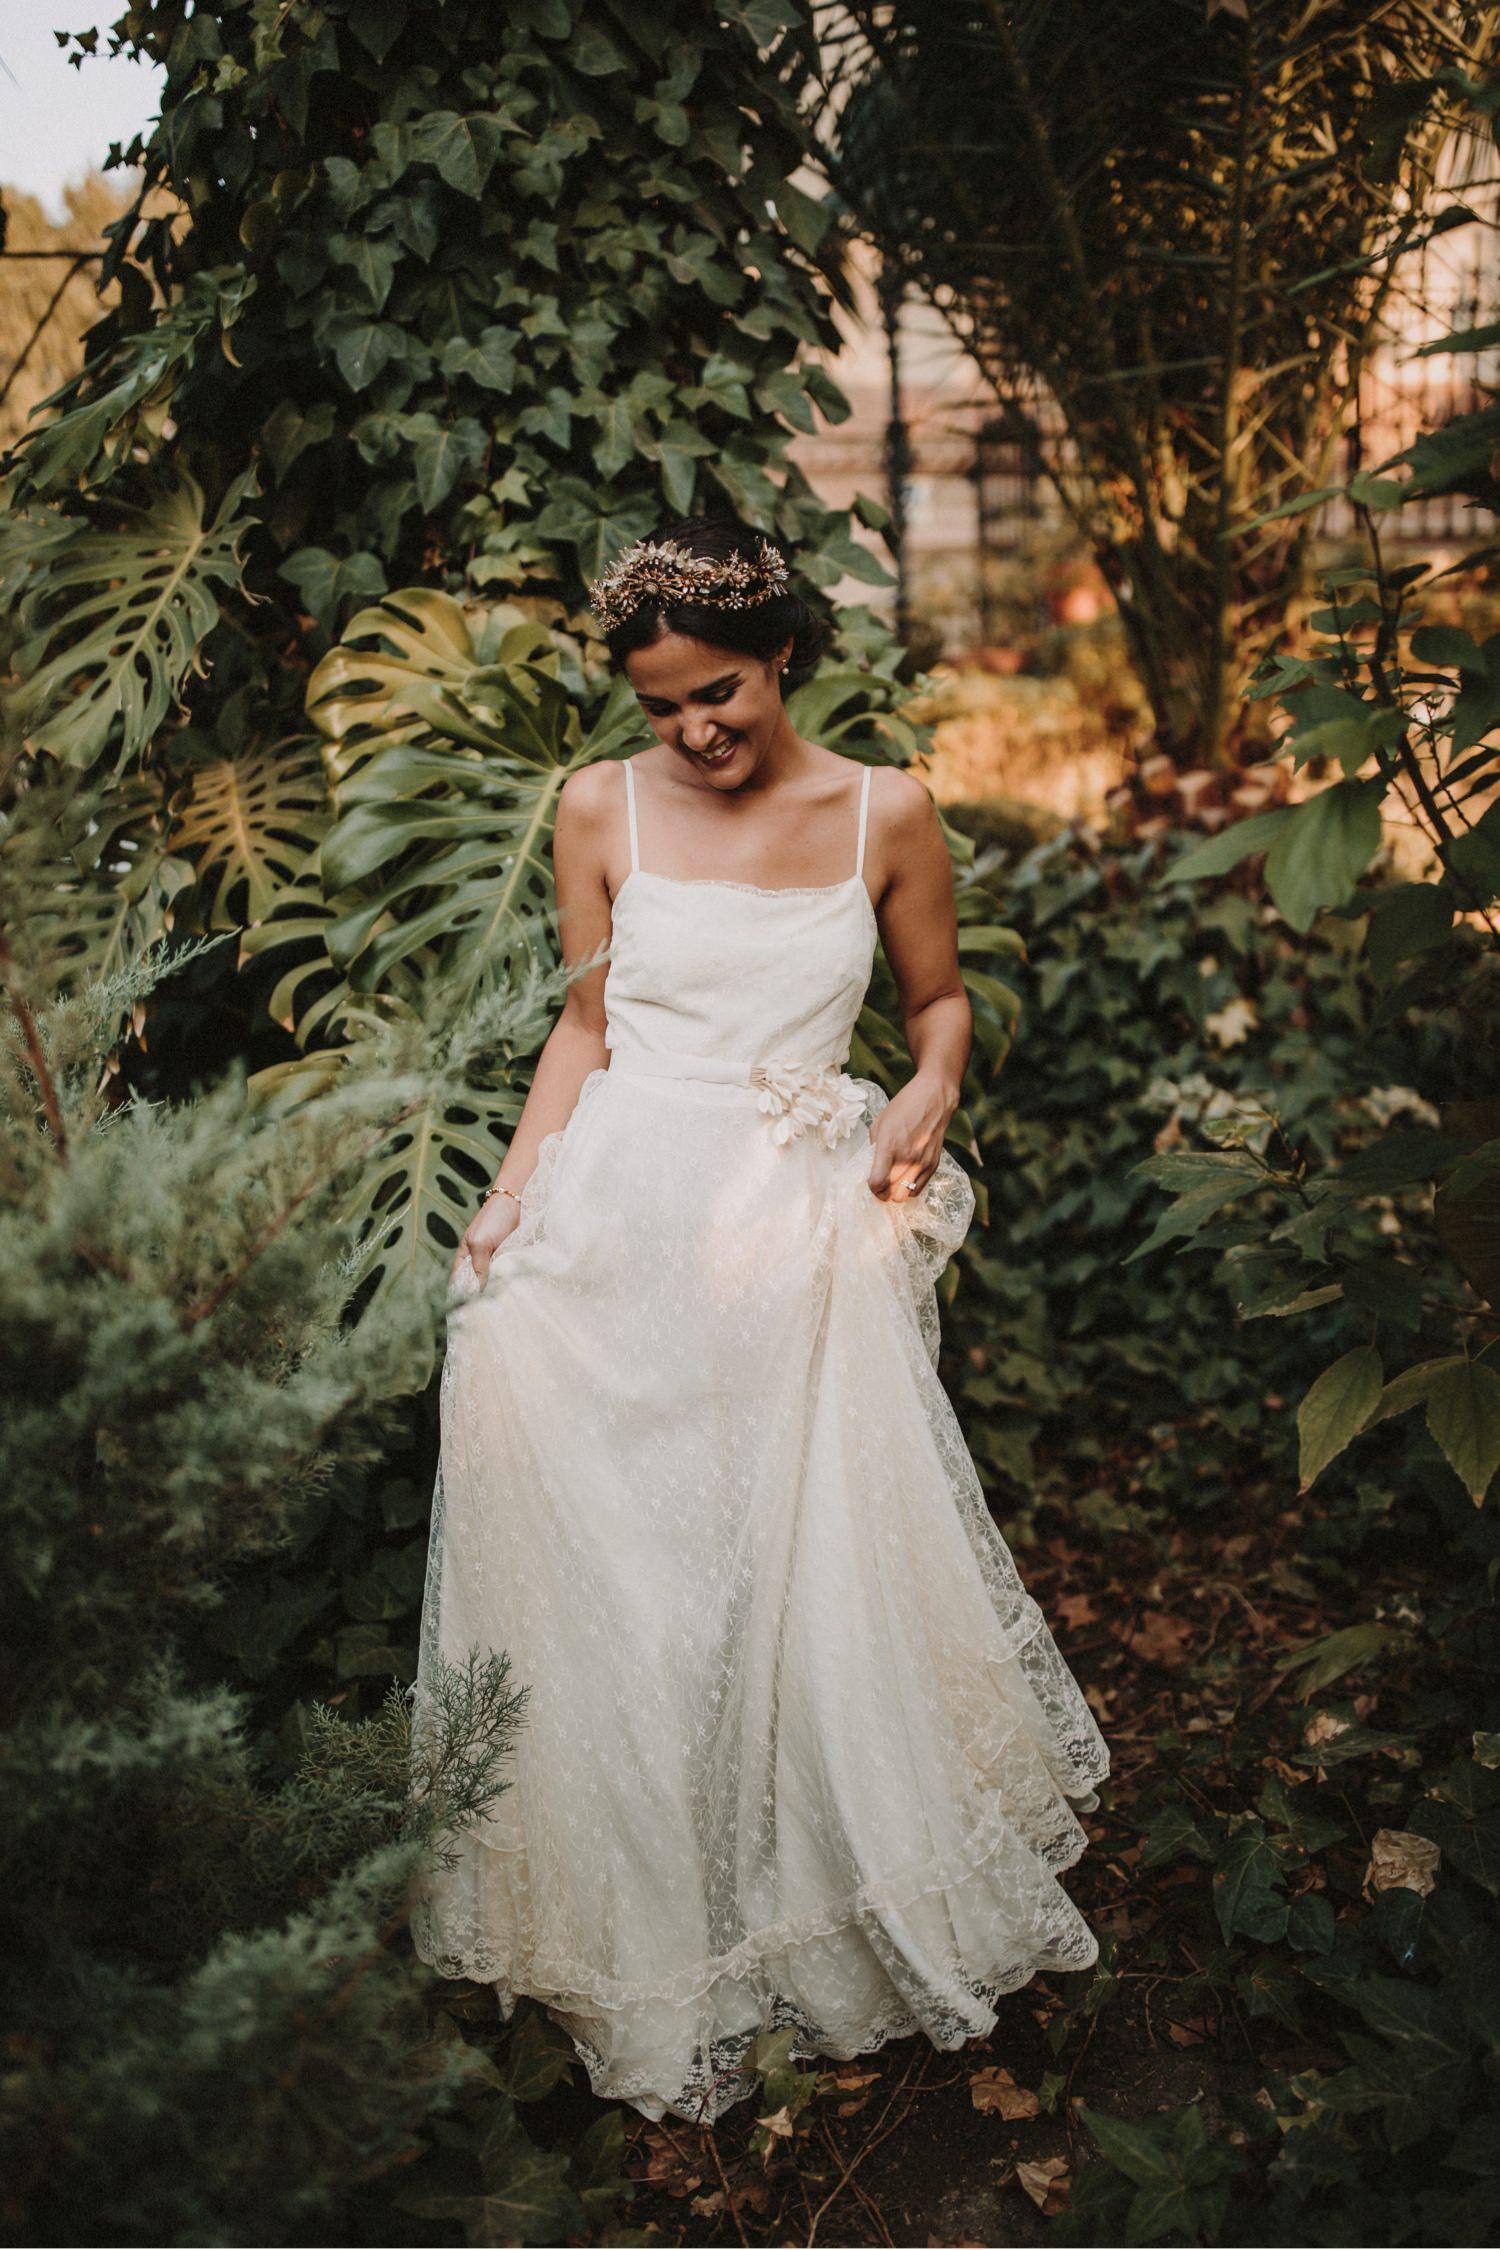 123_wedding-ernestovillalba-maria-daniel-8828-ASE.jpg